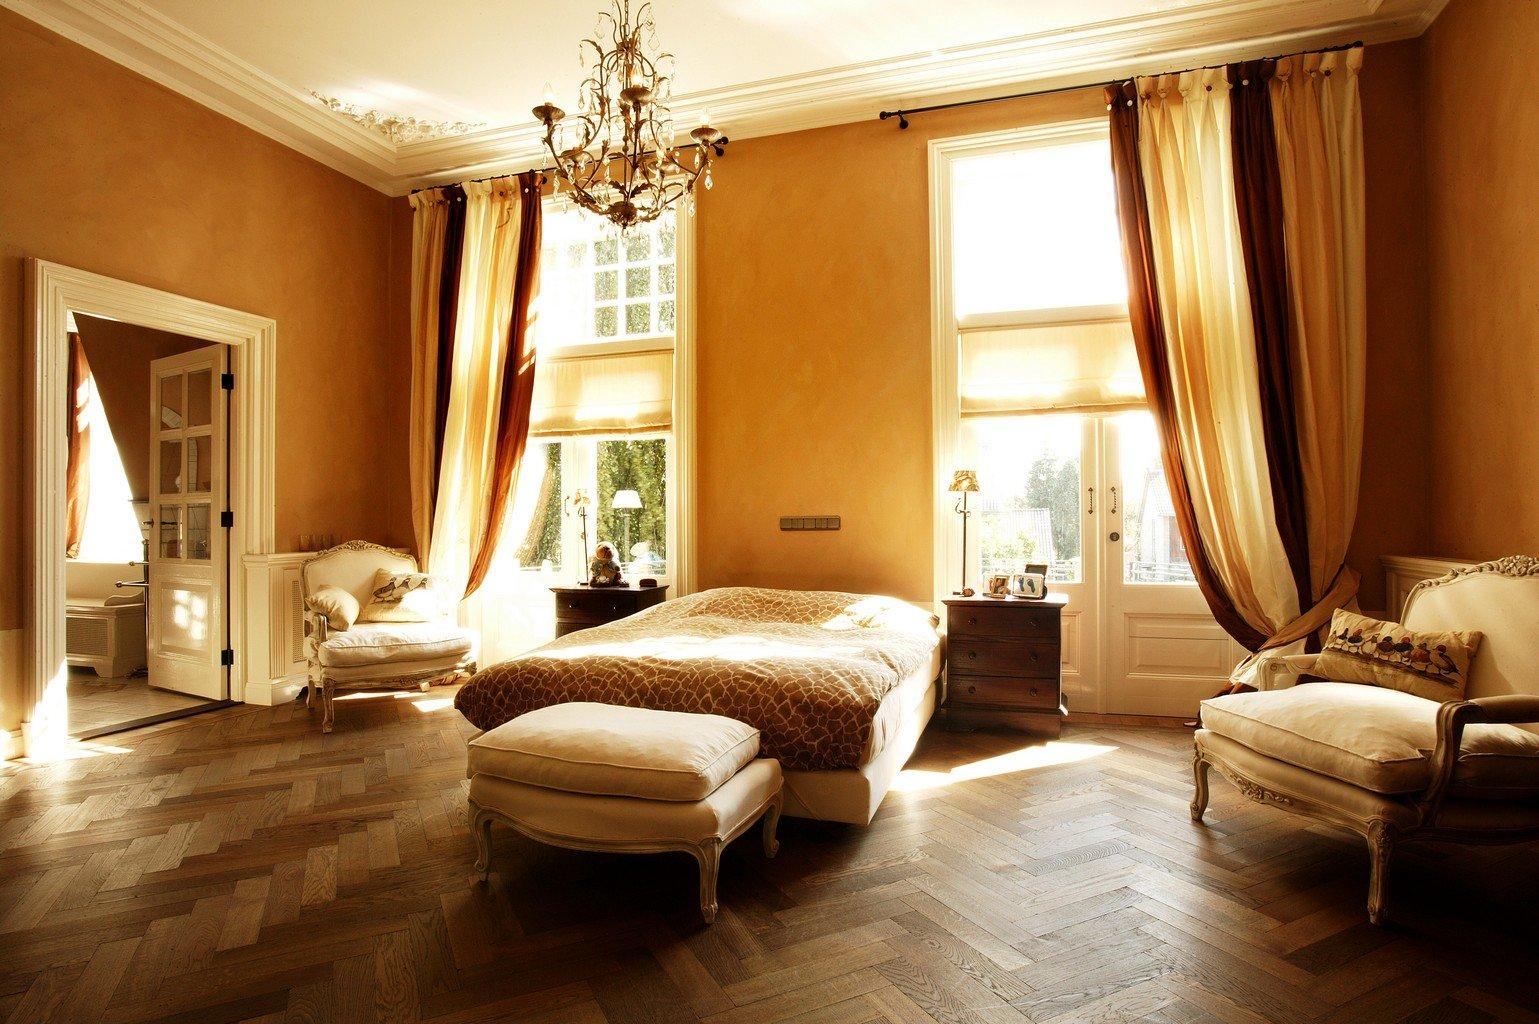 traditional herringbone wood flooring